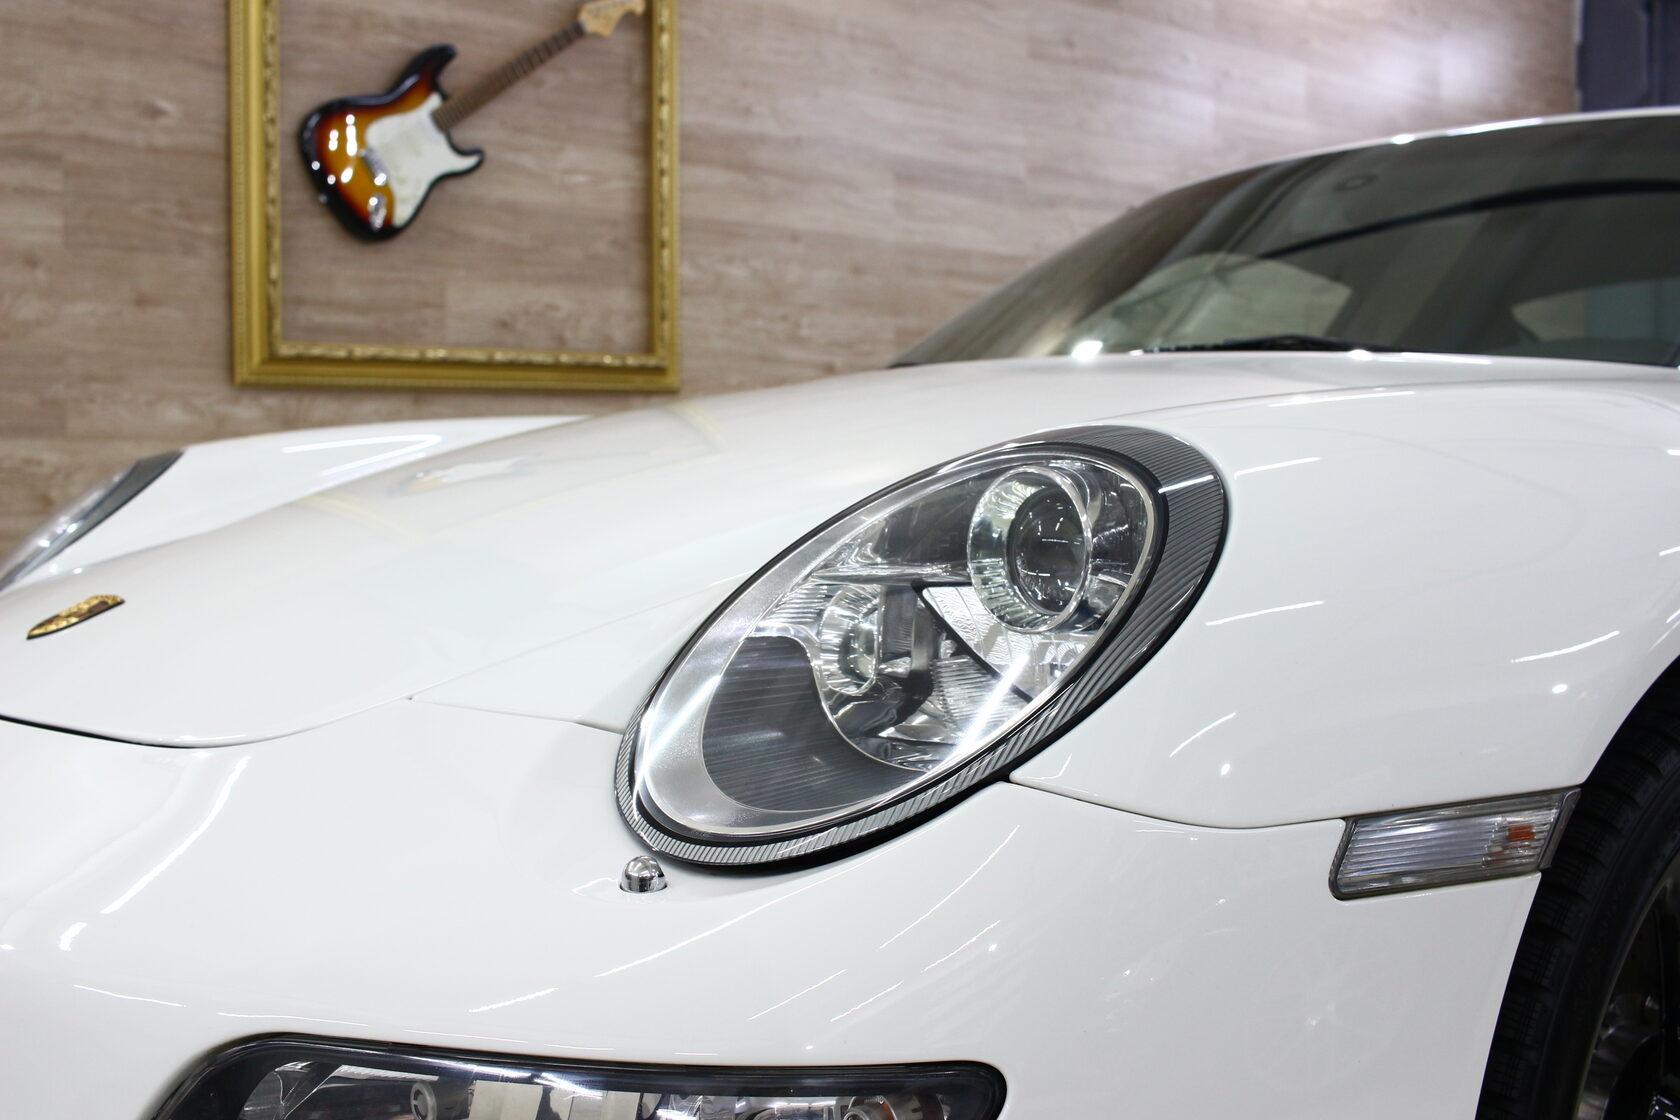 Porsche 911 Carrera 4S, порше 911, детейлинг, реставрация, покраска кожи, полирвока фар, детейлинг центр москва